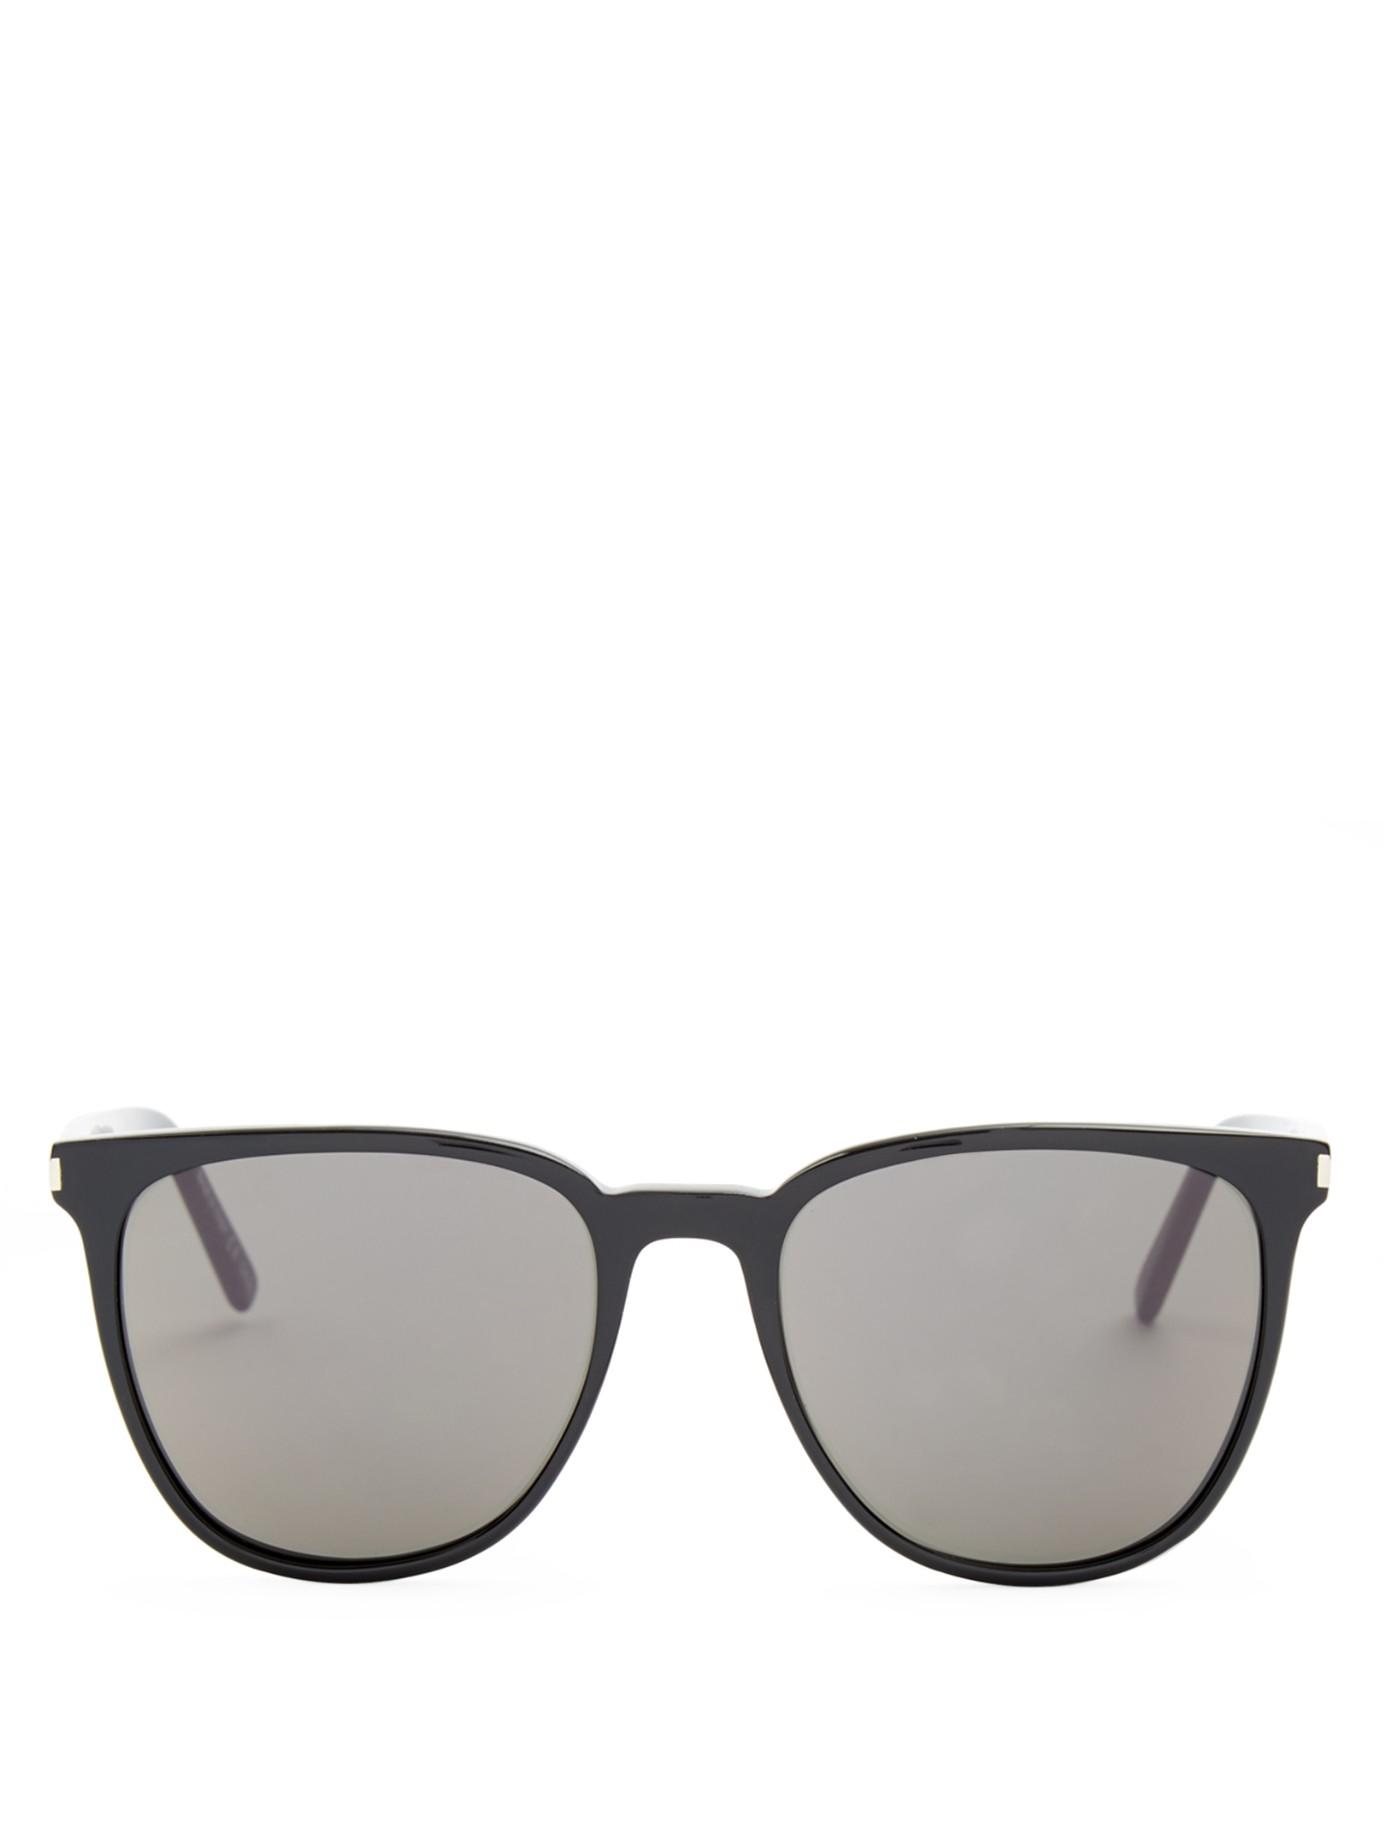 Balenciaga Black Square Frame Sunglasses   City of Kenmore, Washington